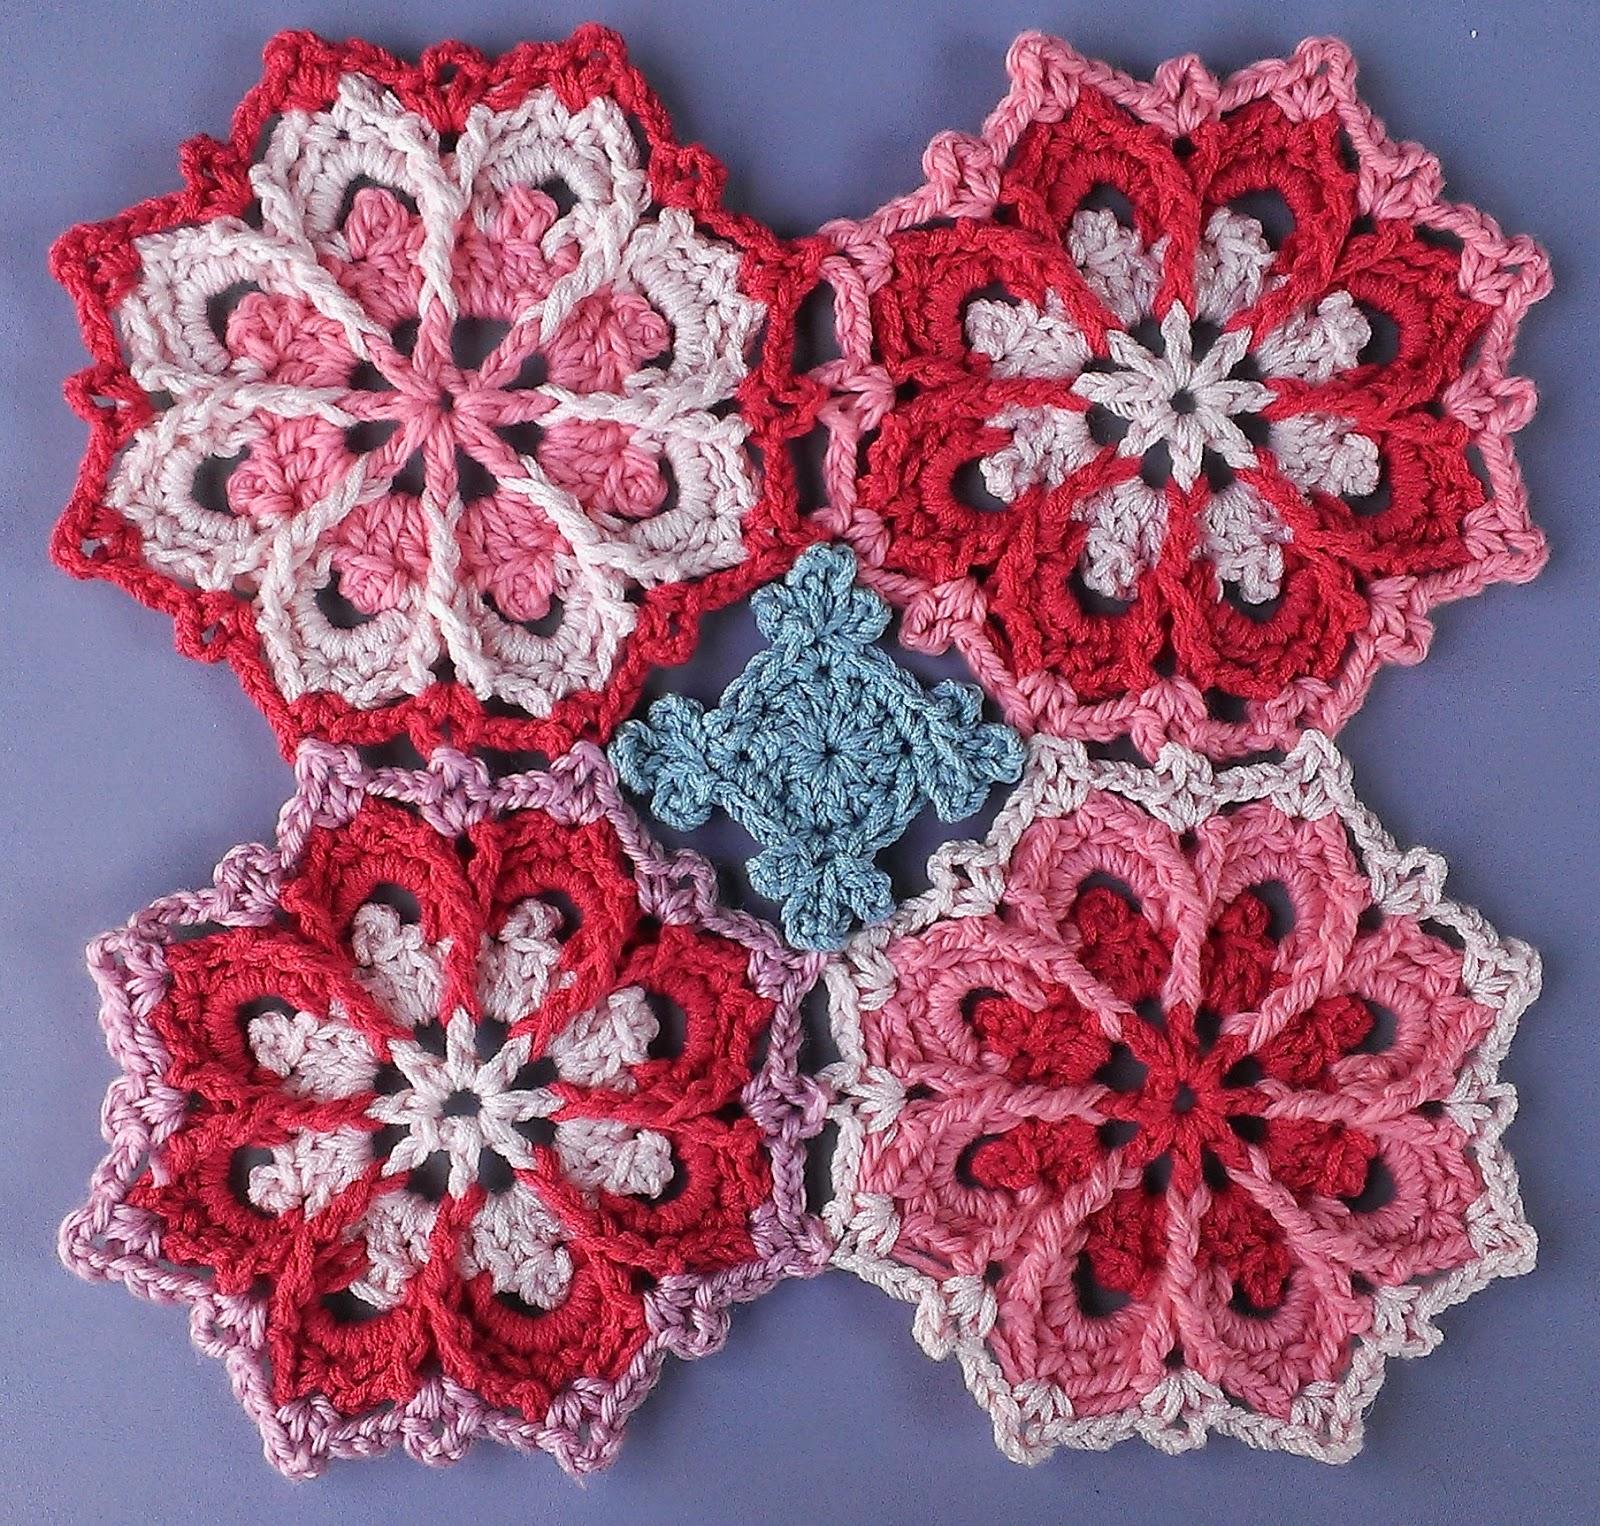 Crochet motifs crochet motif construction webinar wgstmjm